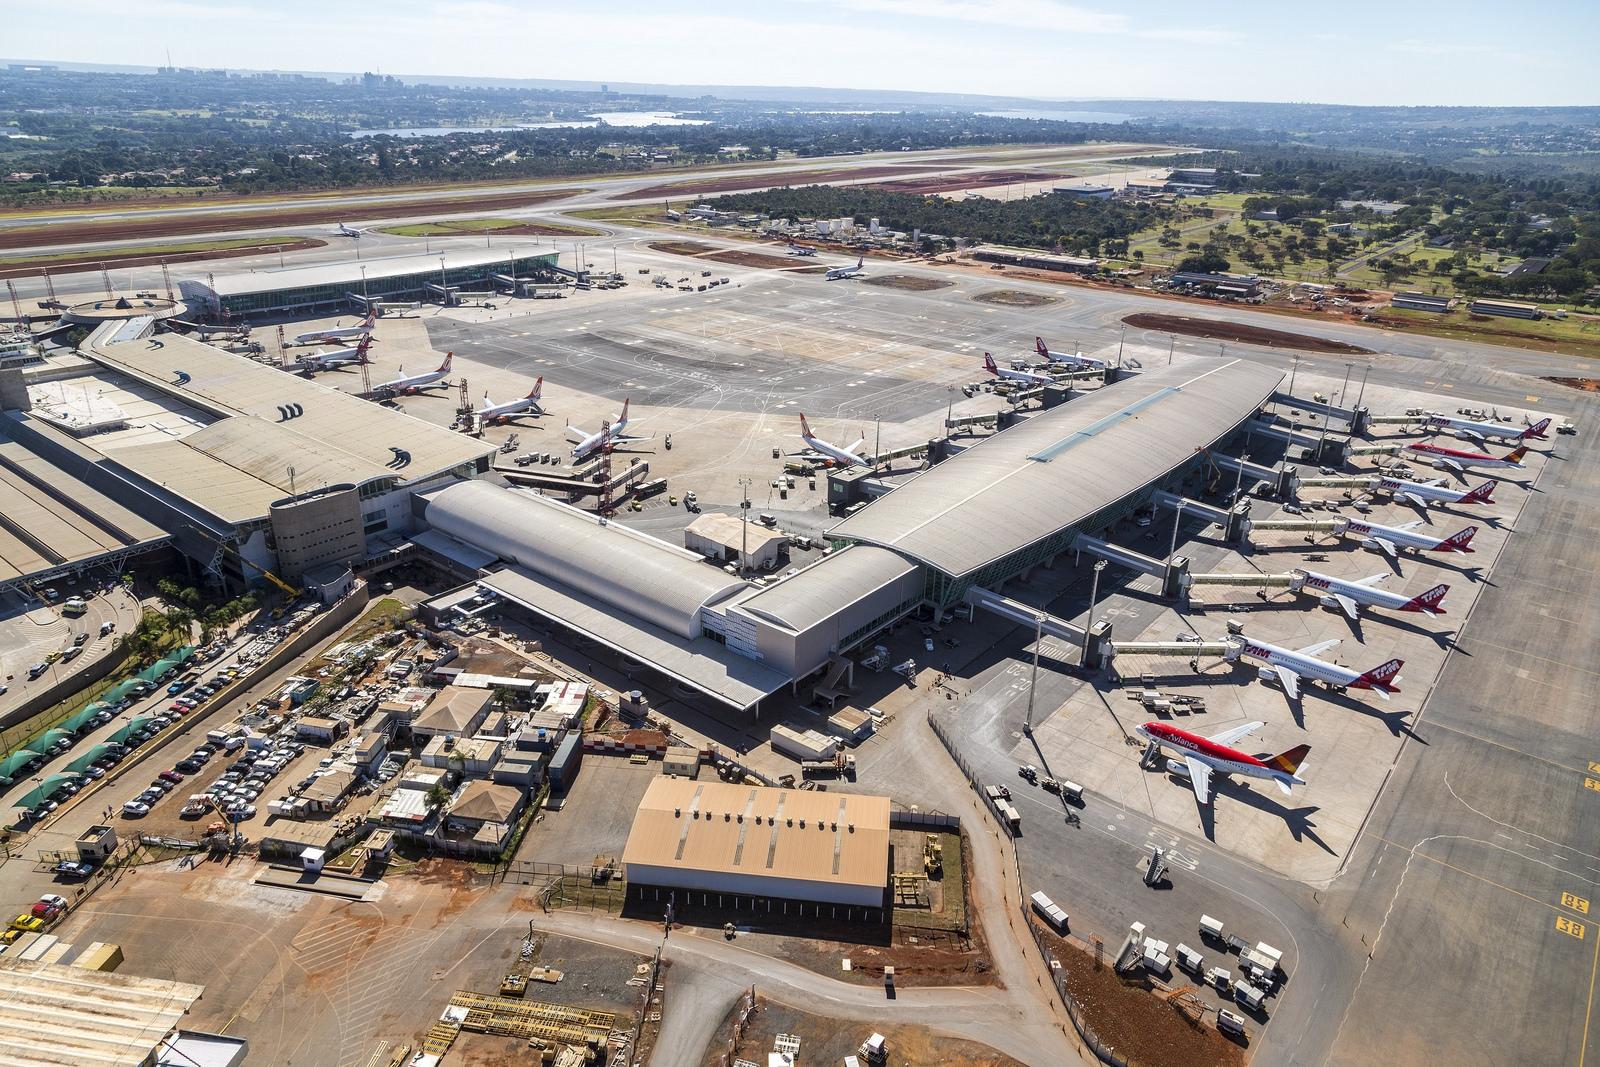 Ver fotos do aeroporto de brasilia 24